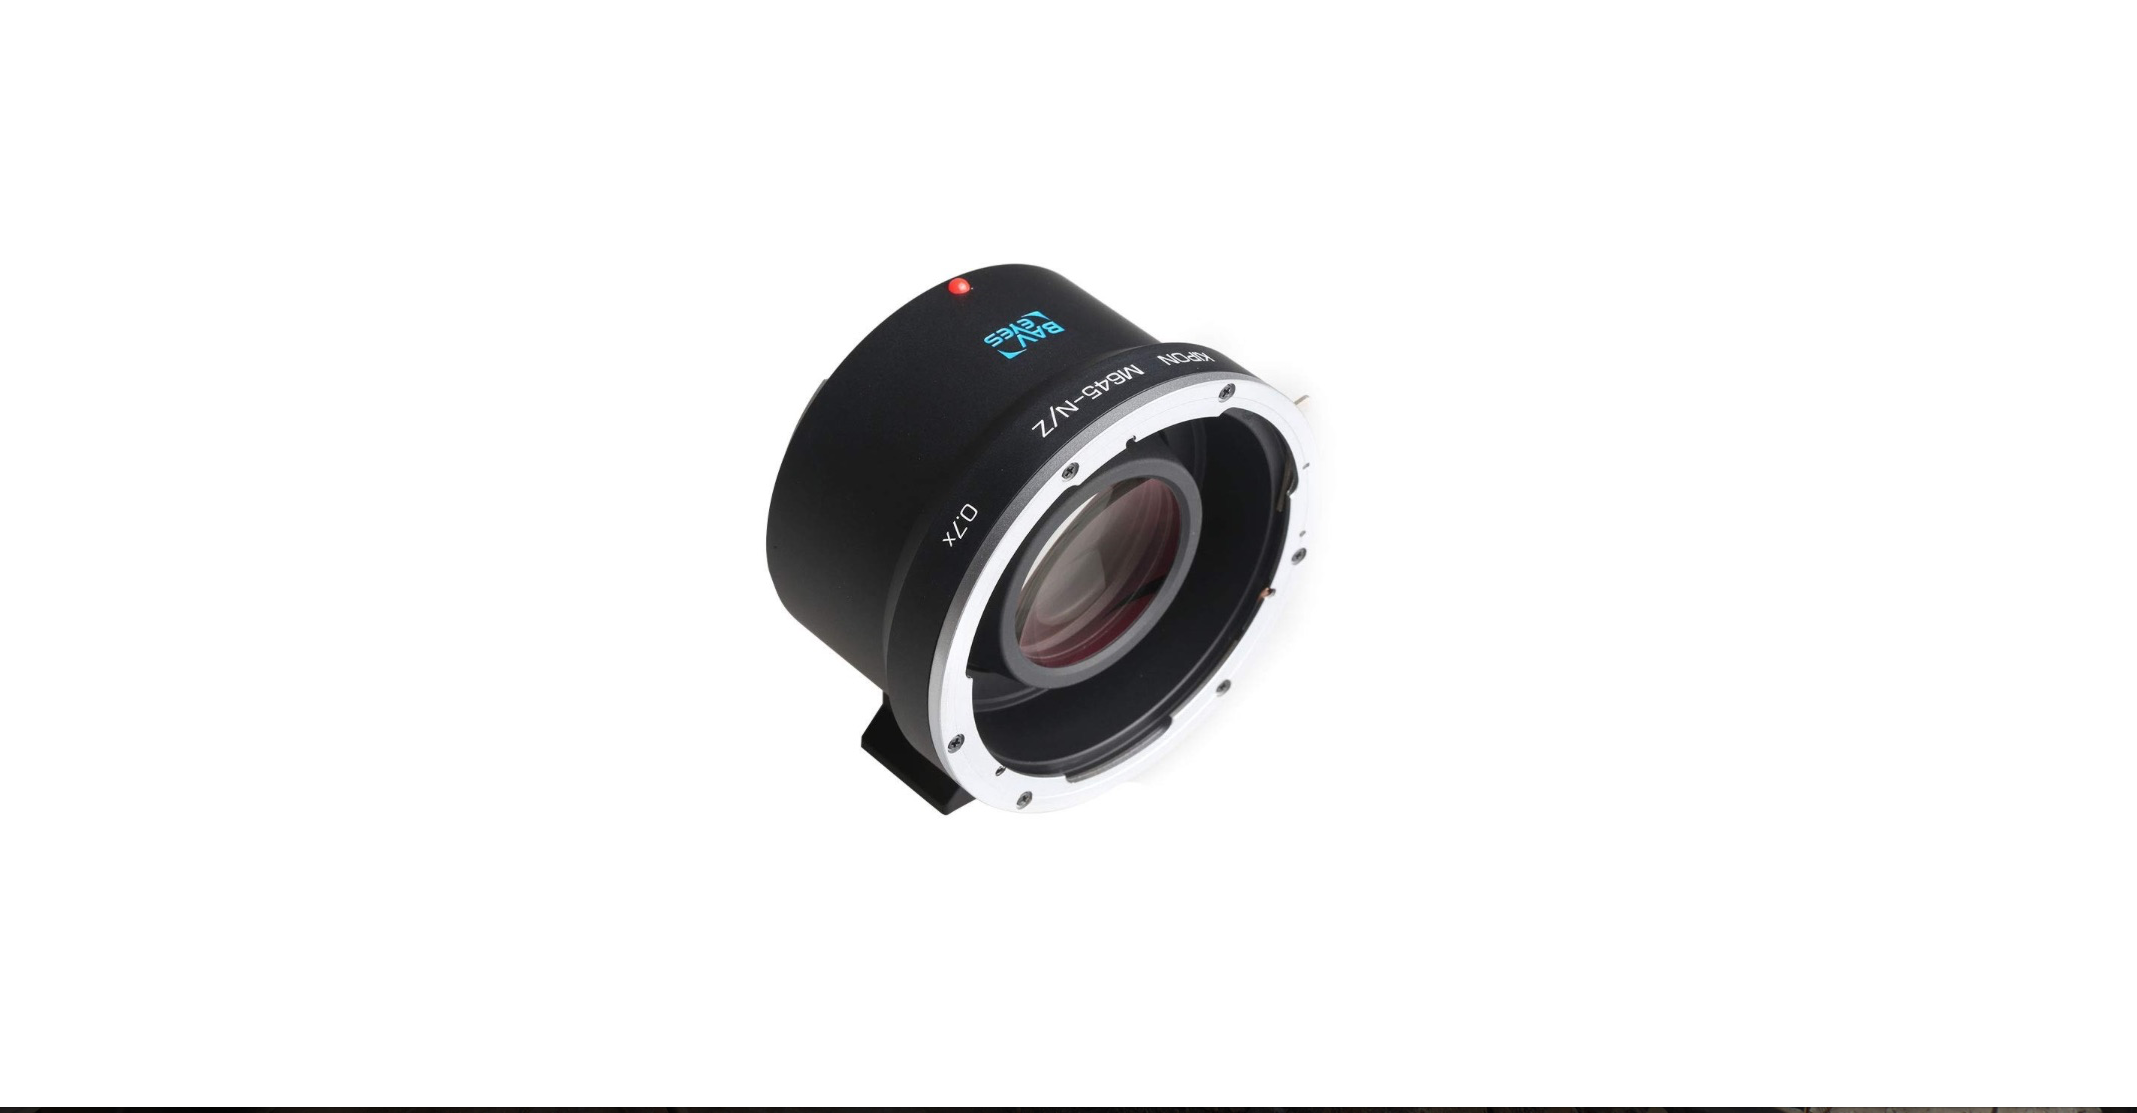 Kipon Adapter for Pentax 67 Mount Lens to Canon EOS R Full Frame Mirrorless Camera